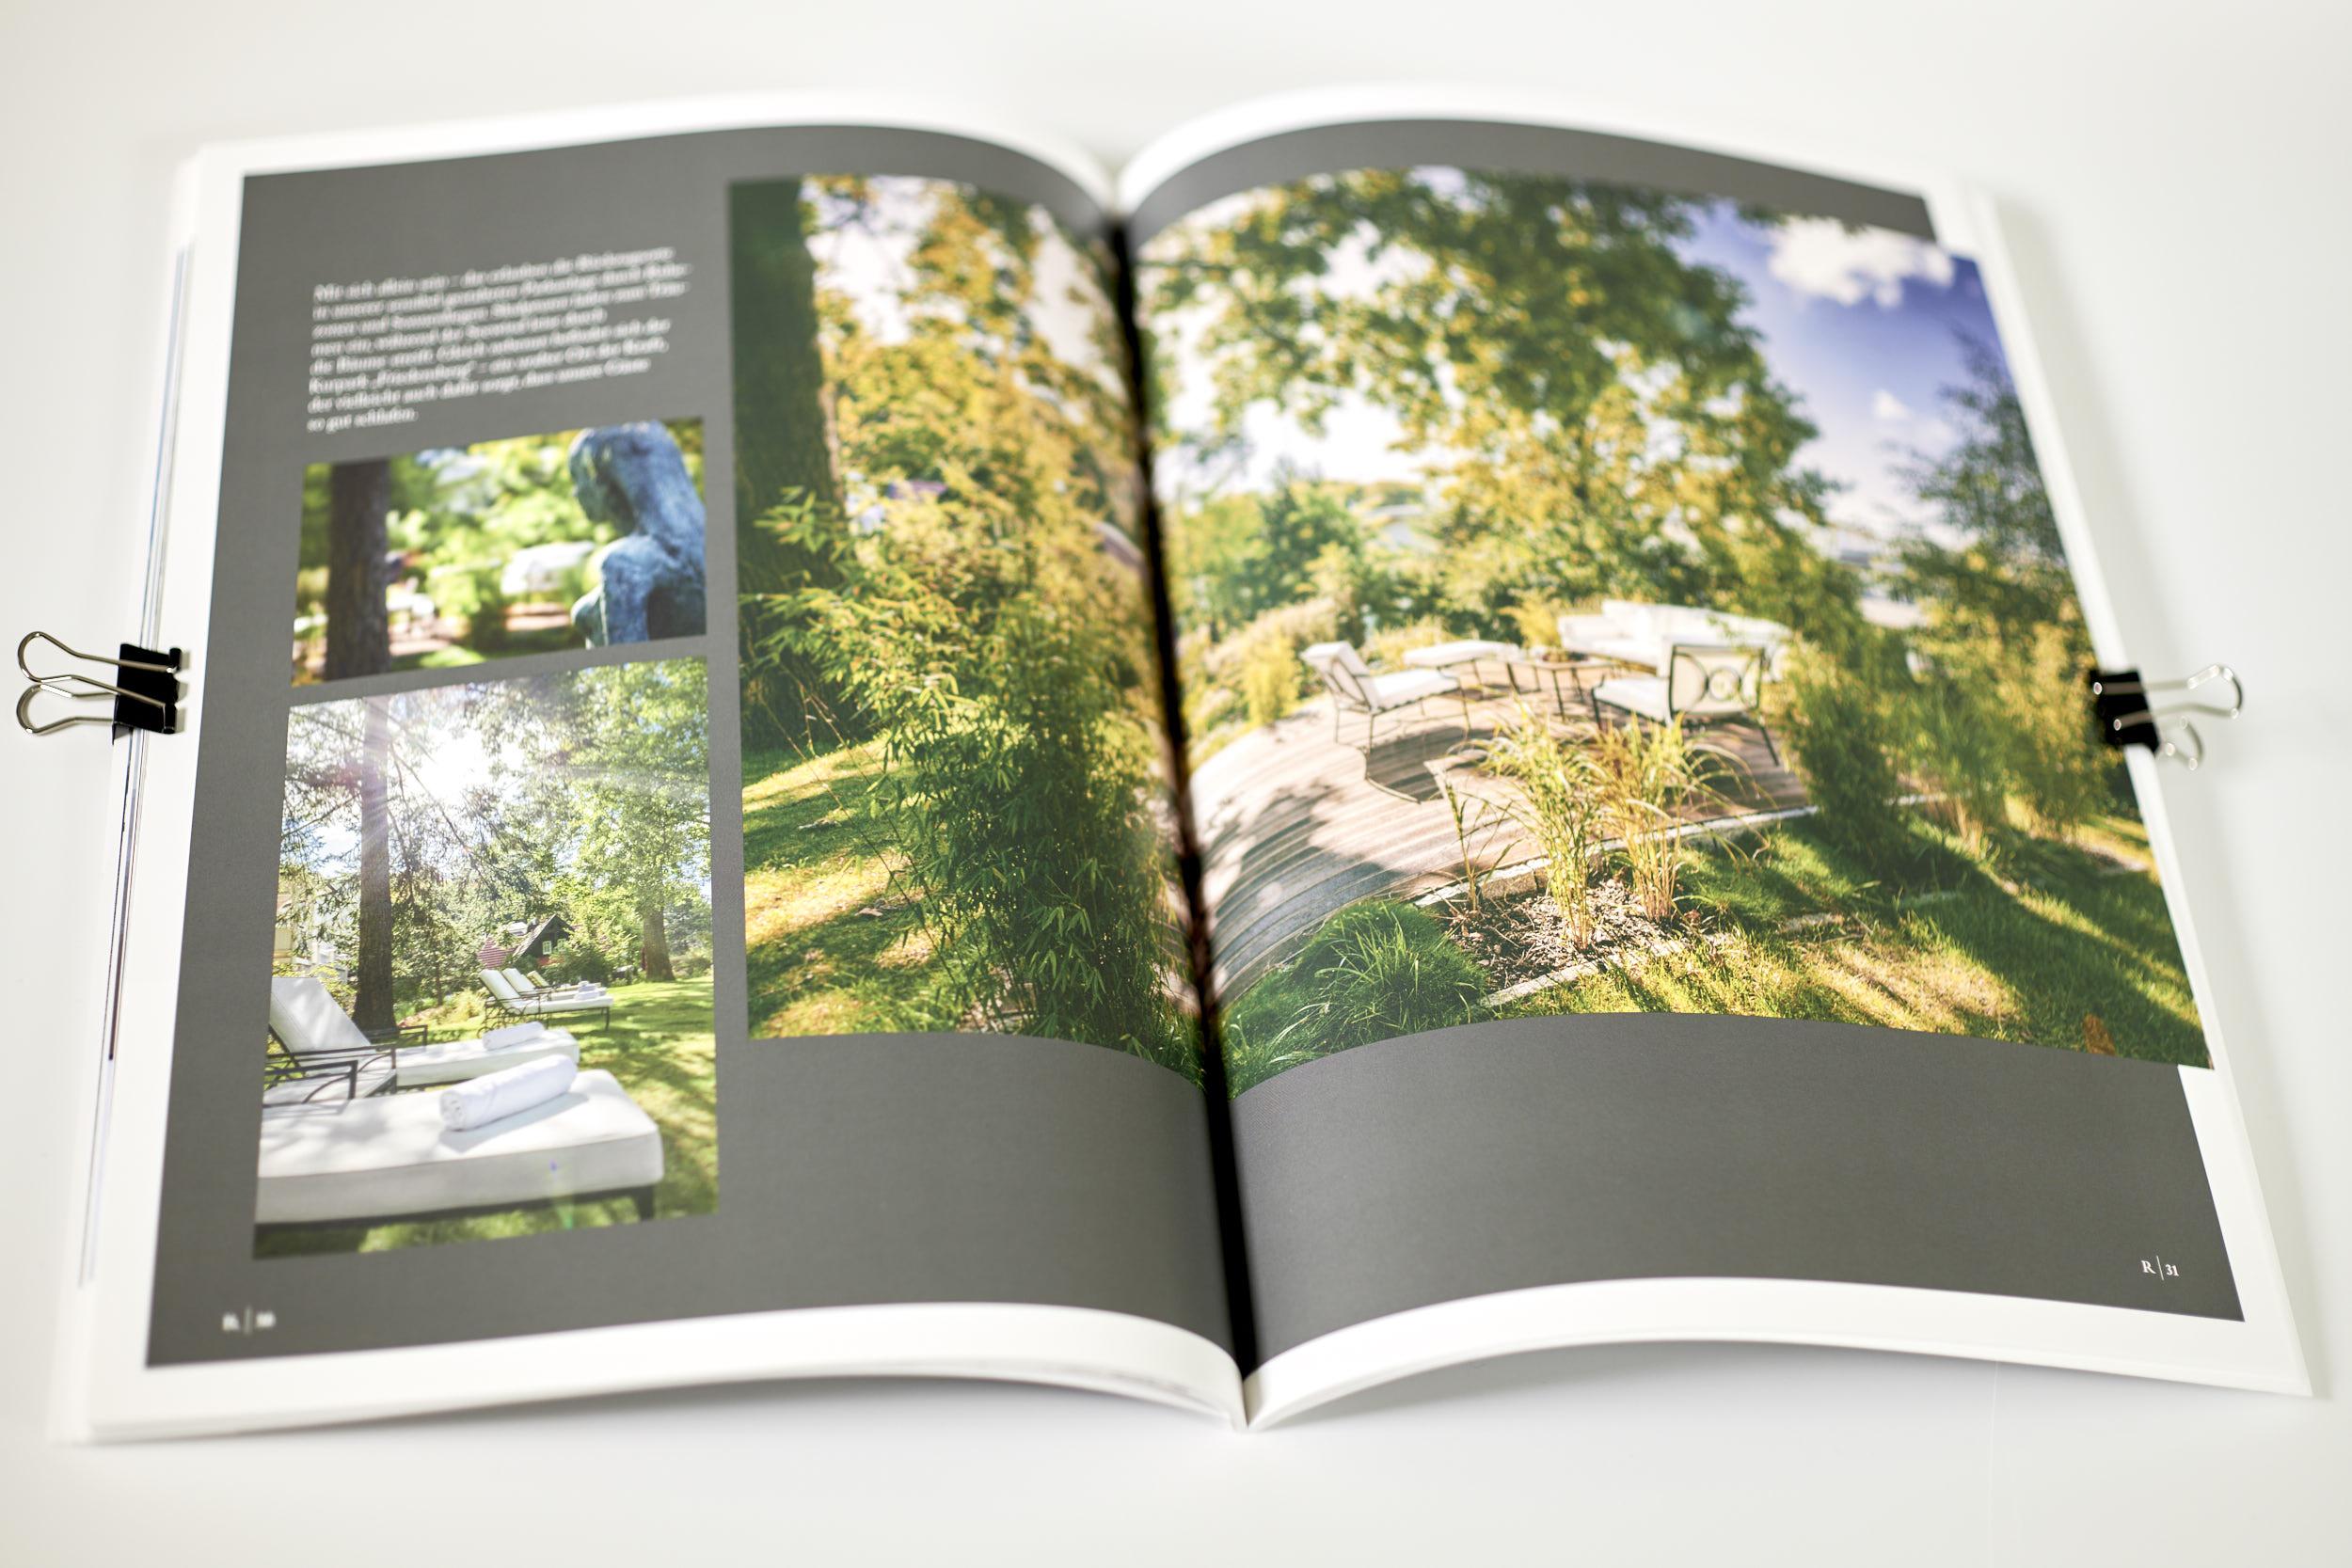 Grafikdesign-Pocha-Burwitz-Foto-Pocha-Burwitz 15